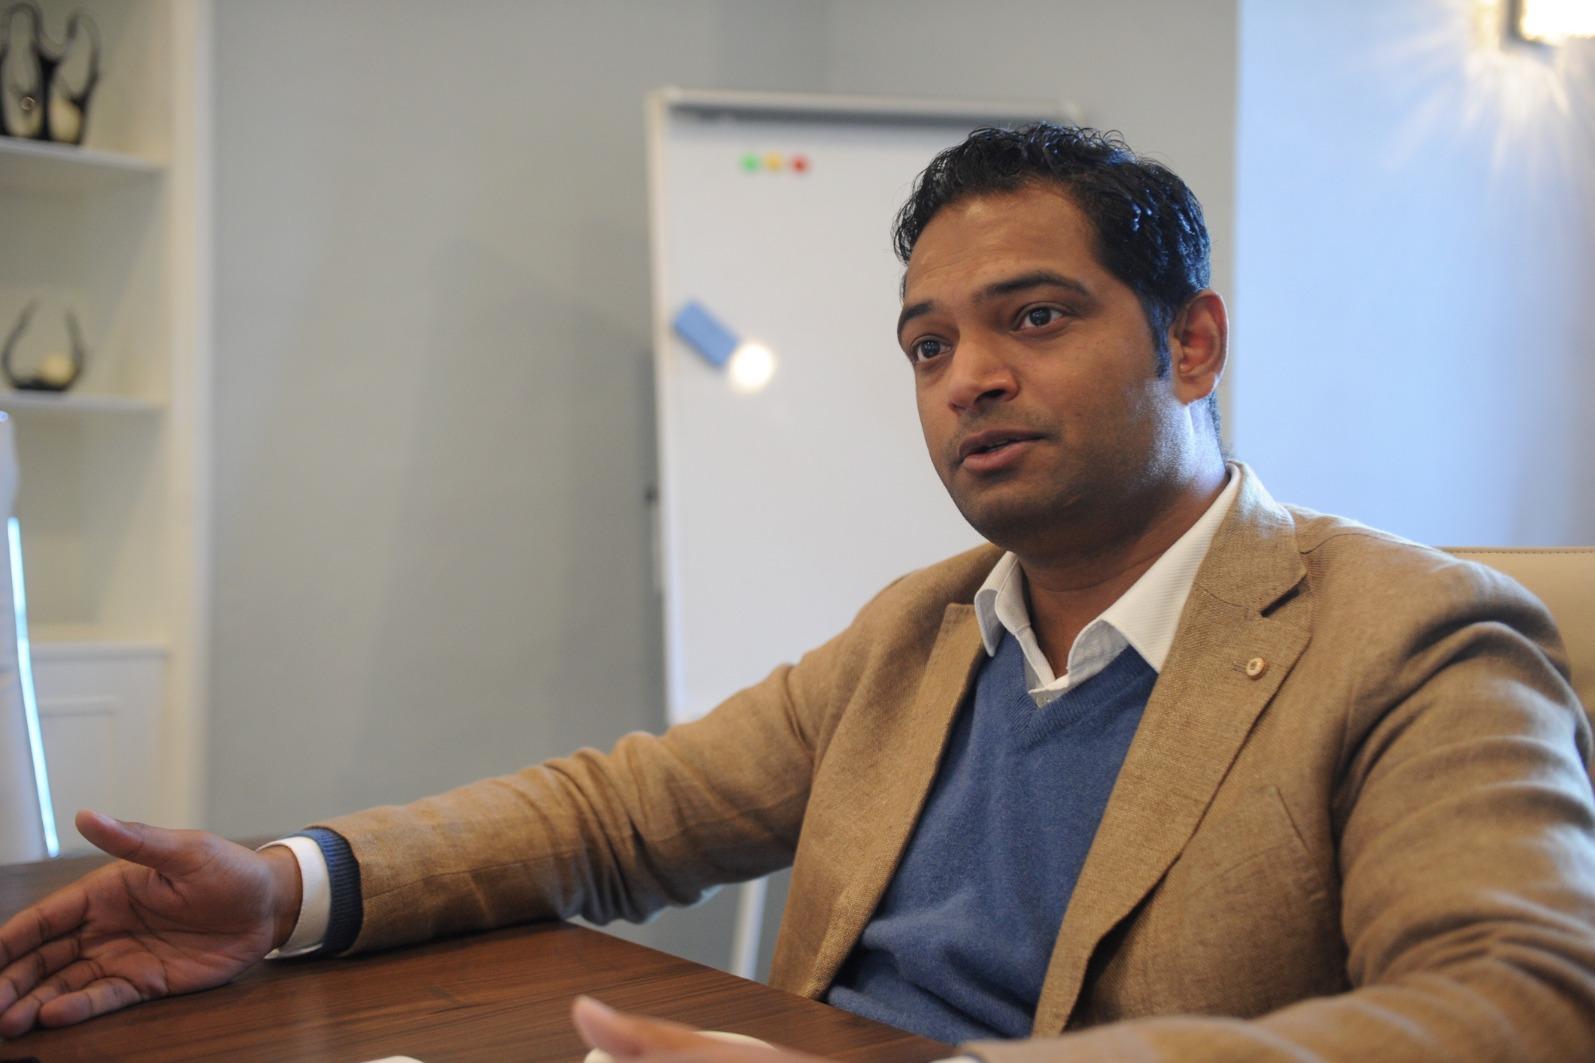 Sri Ram Tumuluri, a director of Vitals who fronted the hospitals deal. Photo: Mark Zammit Cordina